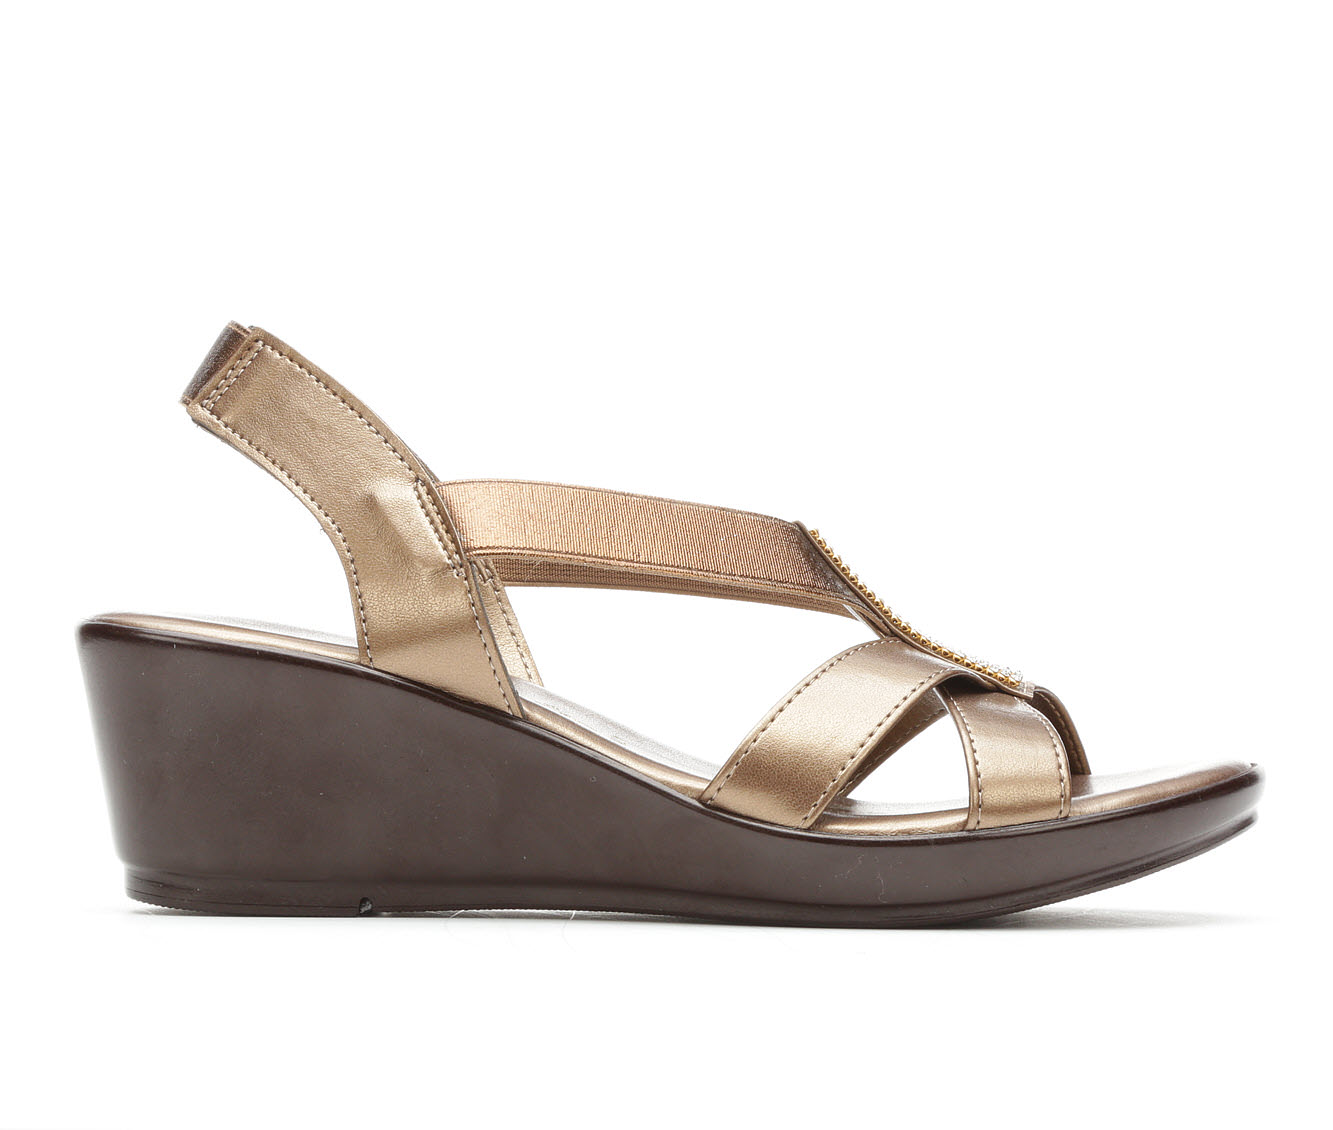 Women's Italian Shoemakers Seek Wedge Sandals (Brown)